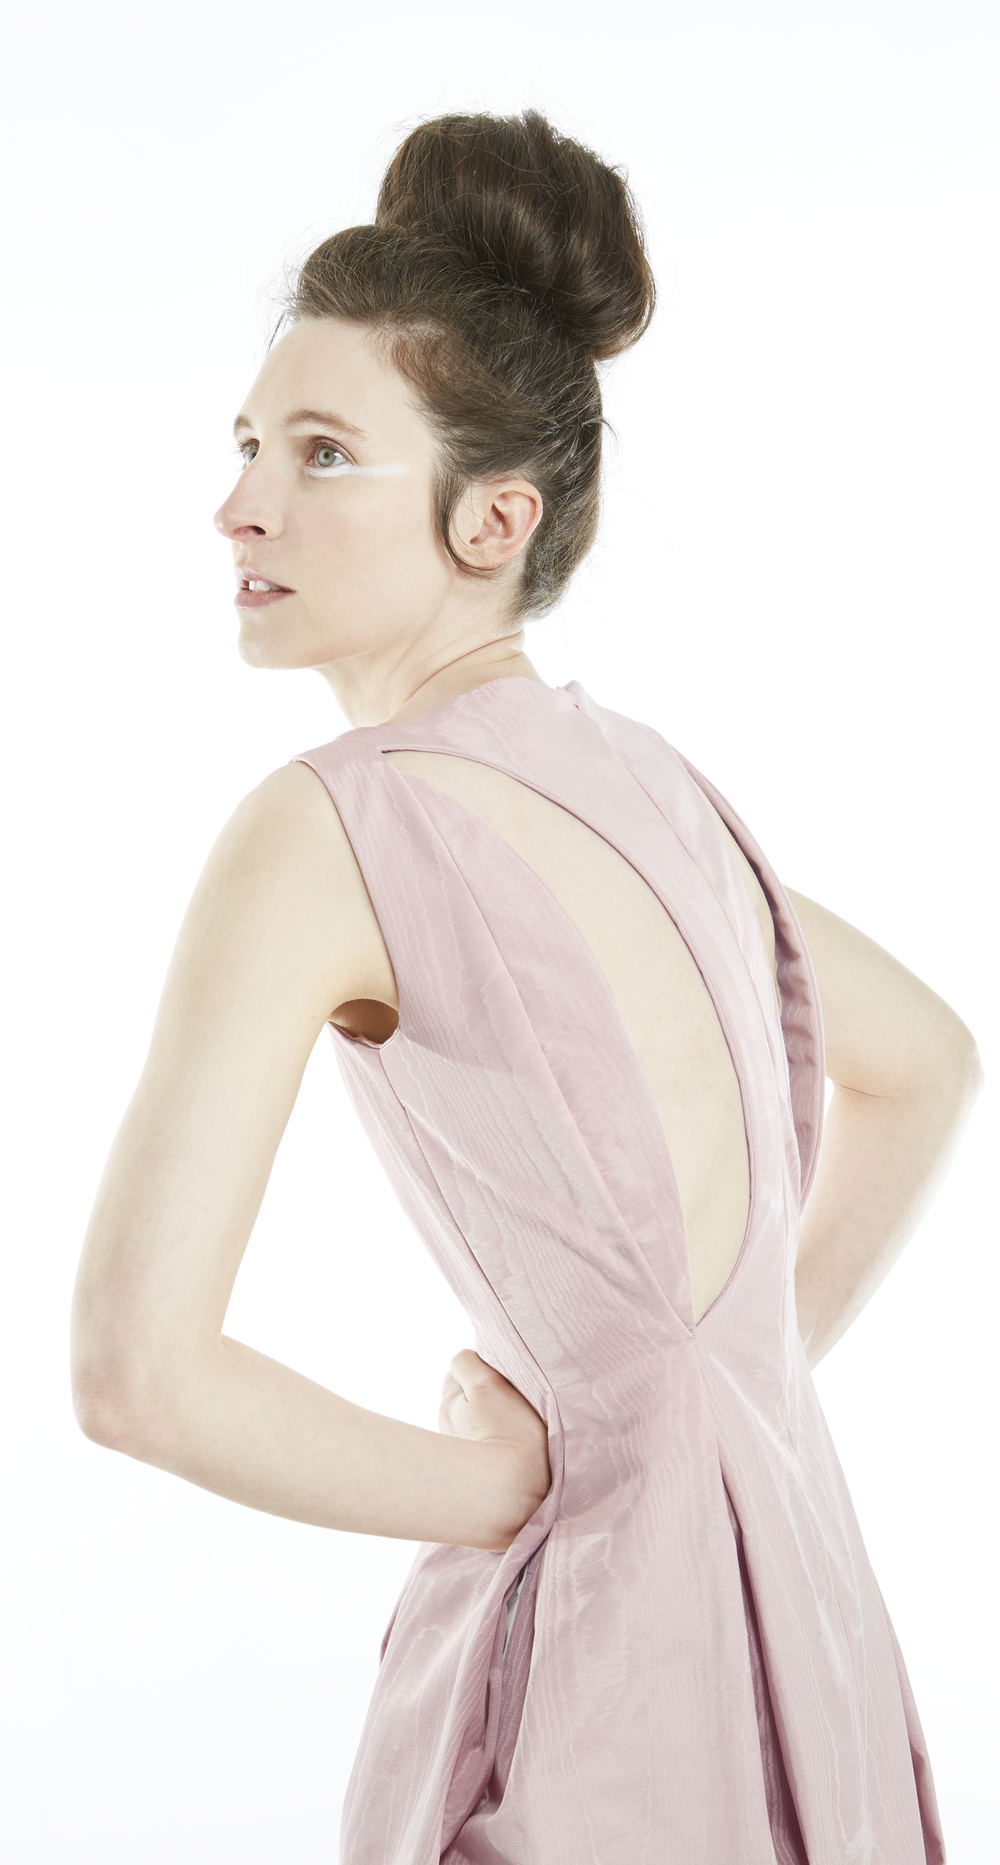 pink_dress_back.jpg